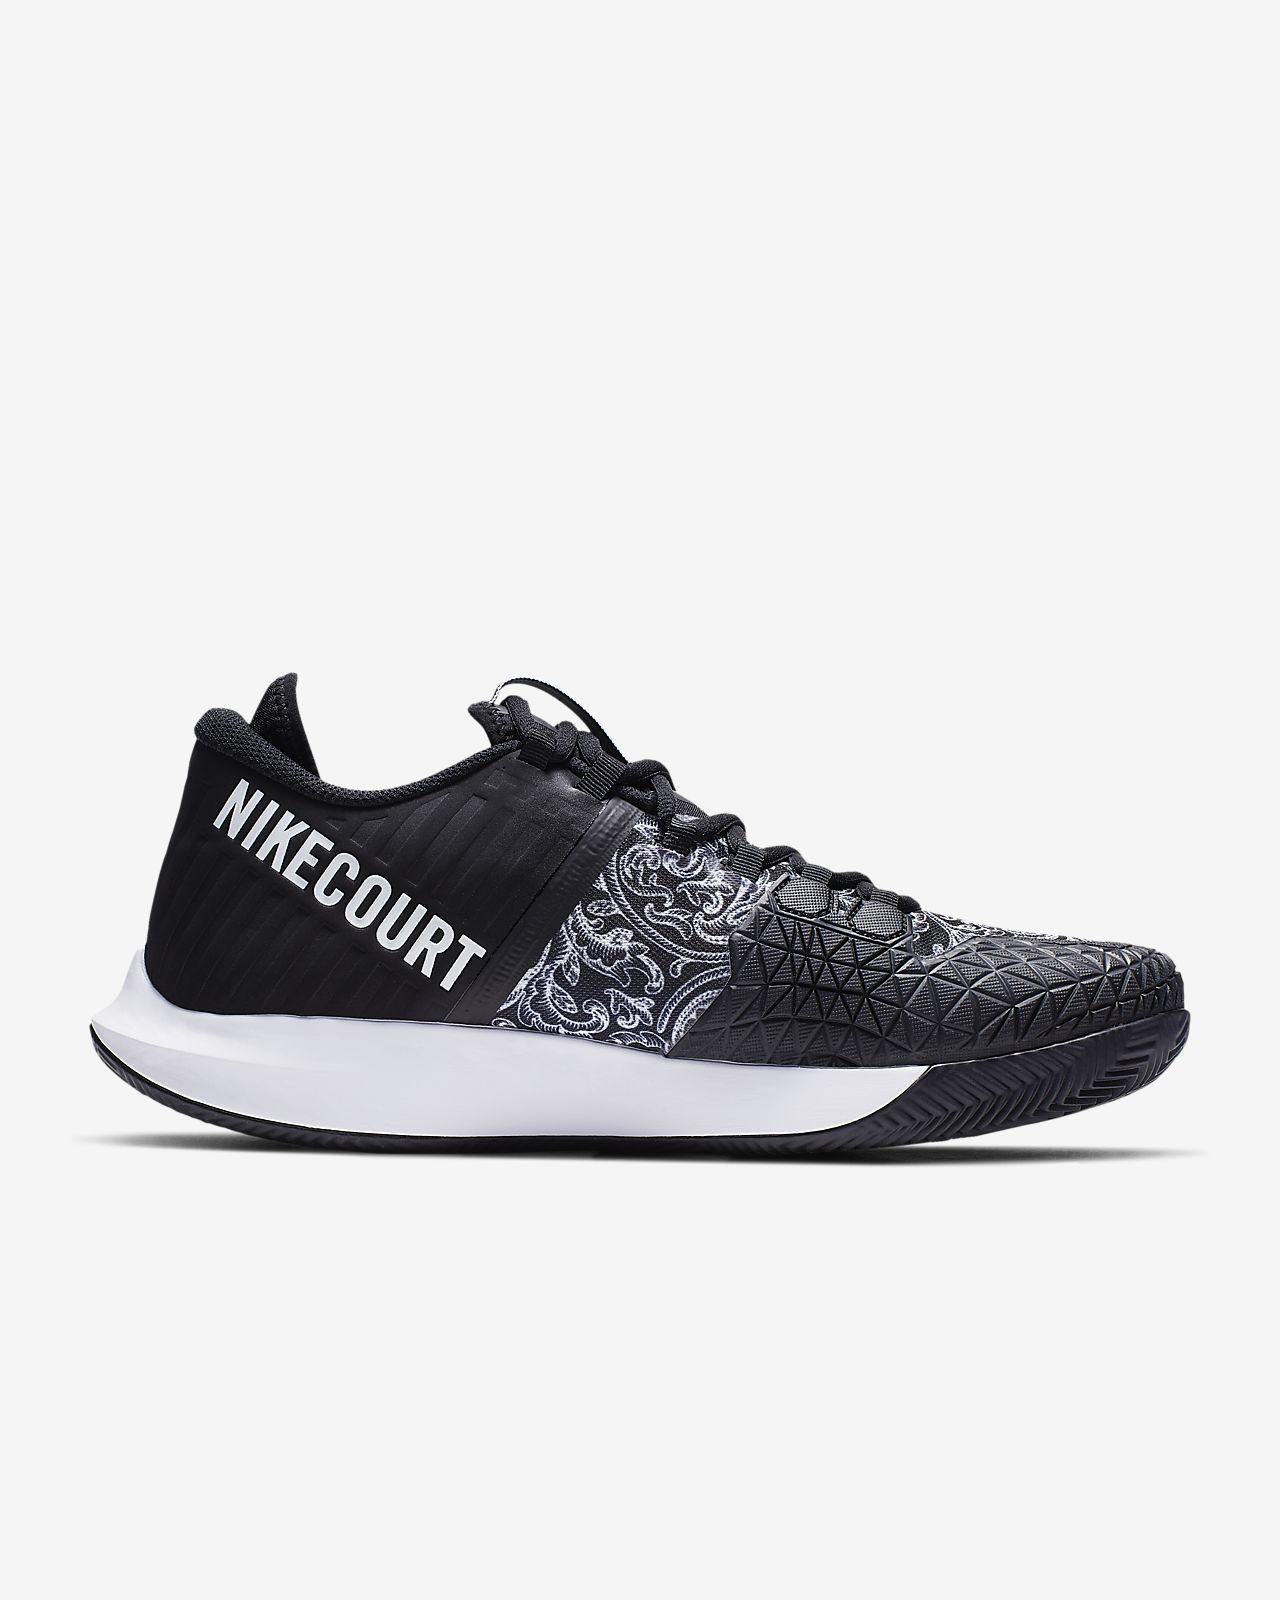 De Homme Tennis Terre Nikecourt Zoom Pour Chaussure Battue Air Zero XiPOkZu